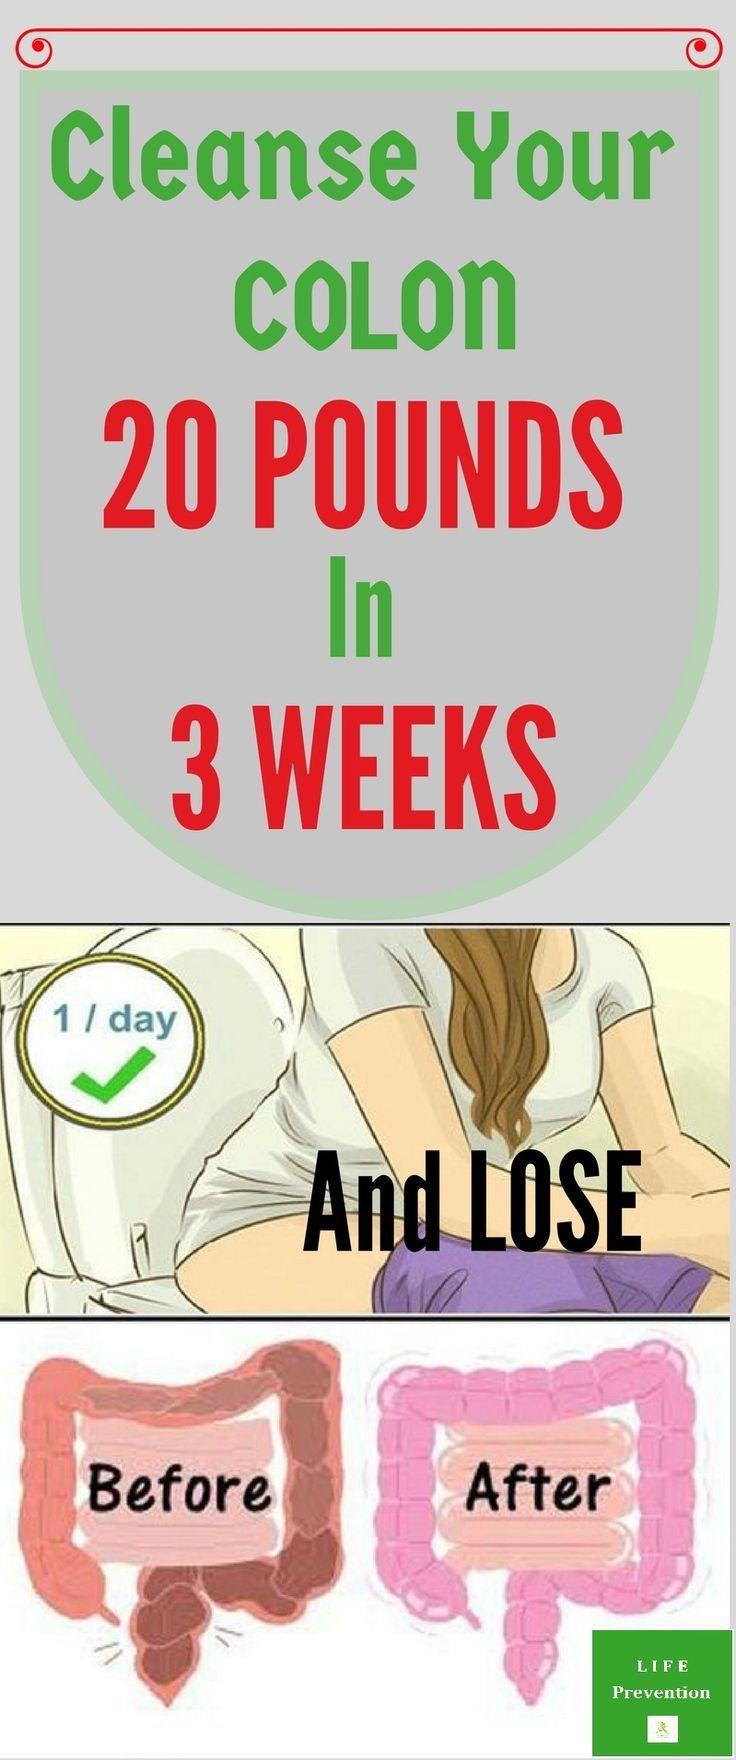 2 week colon cleanse diet